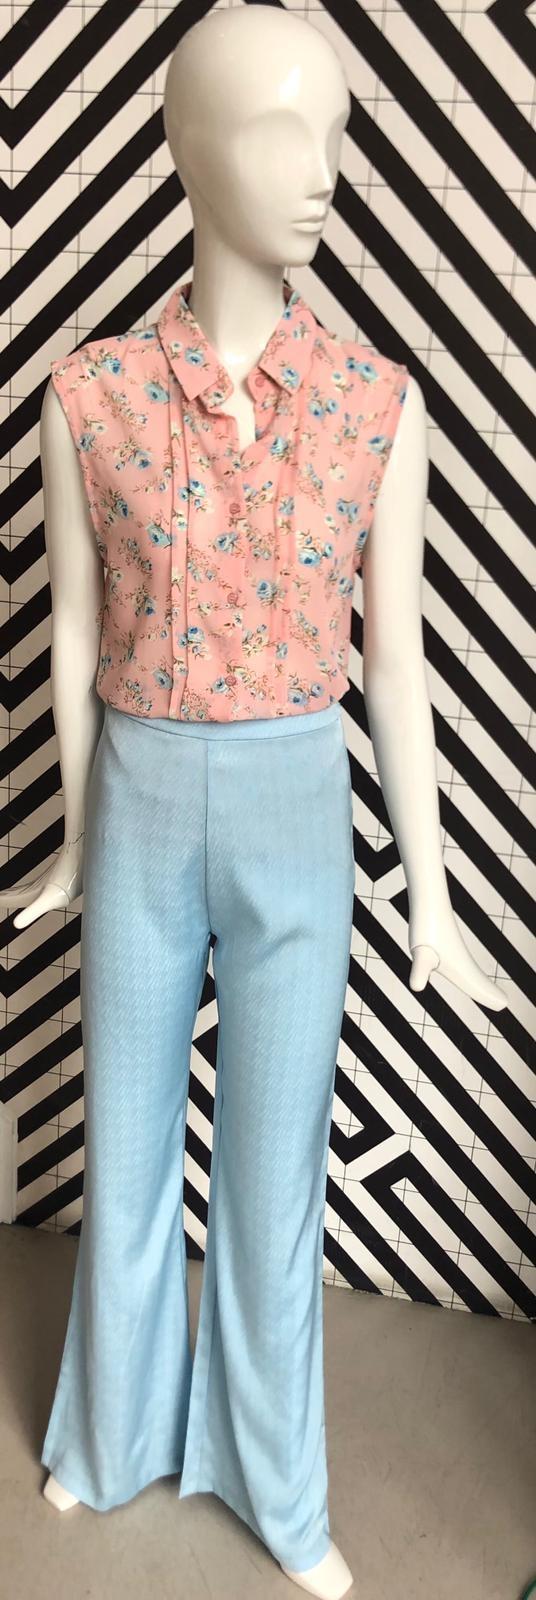 Voyar La Rue Blare flower blouse pink flower